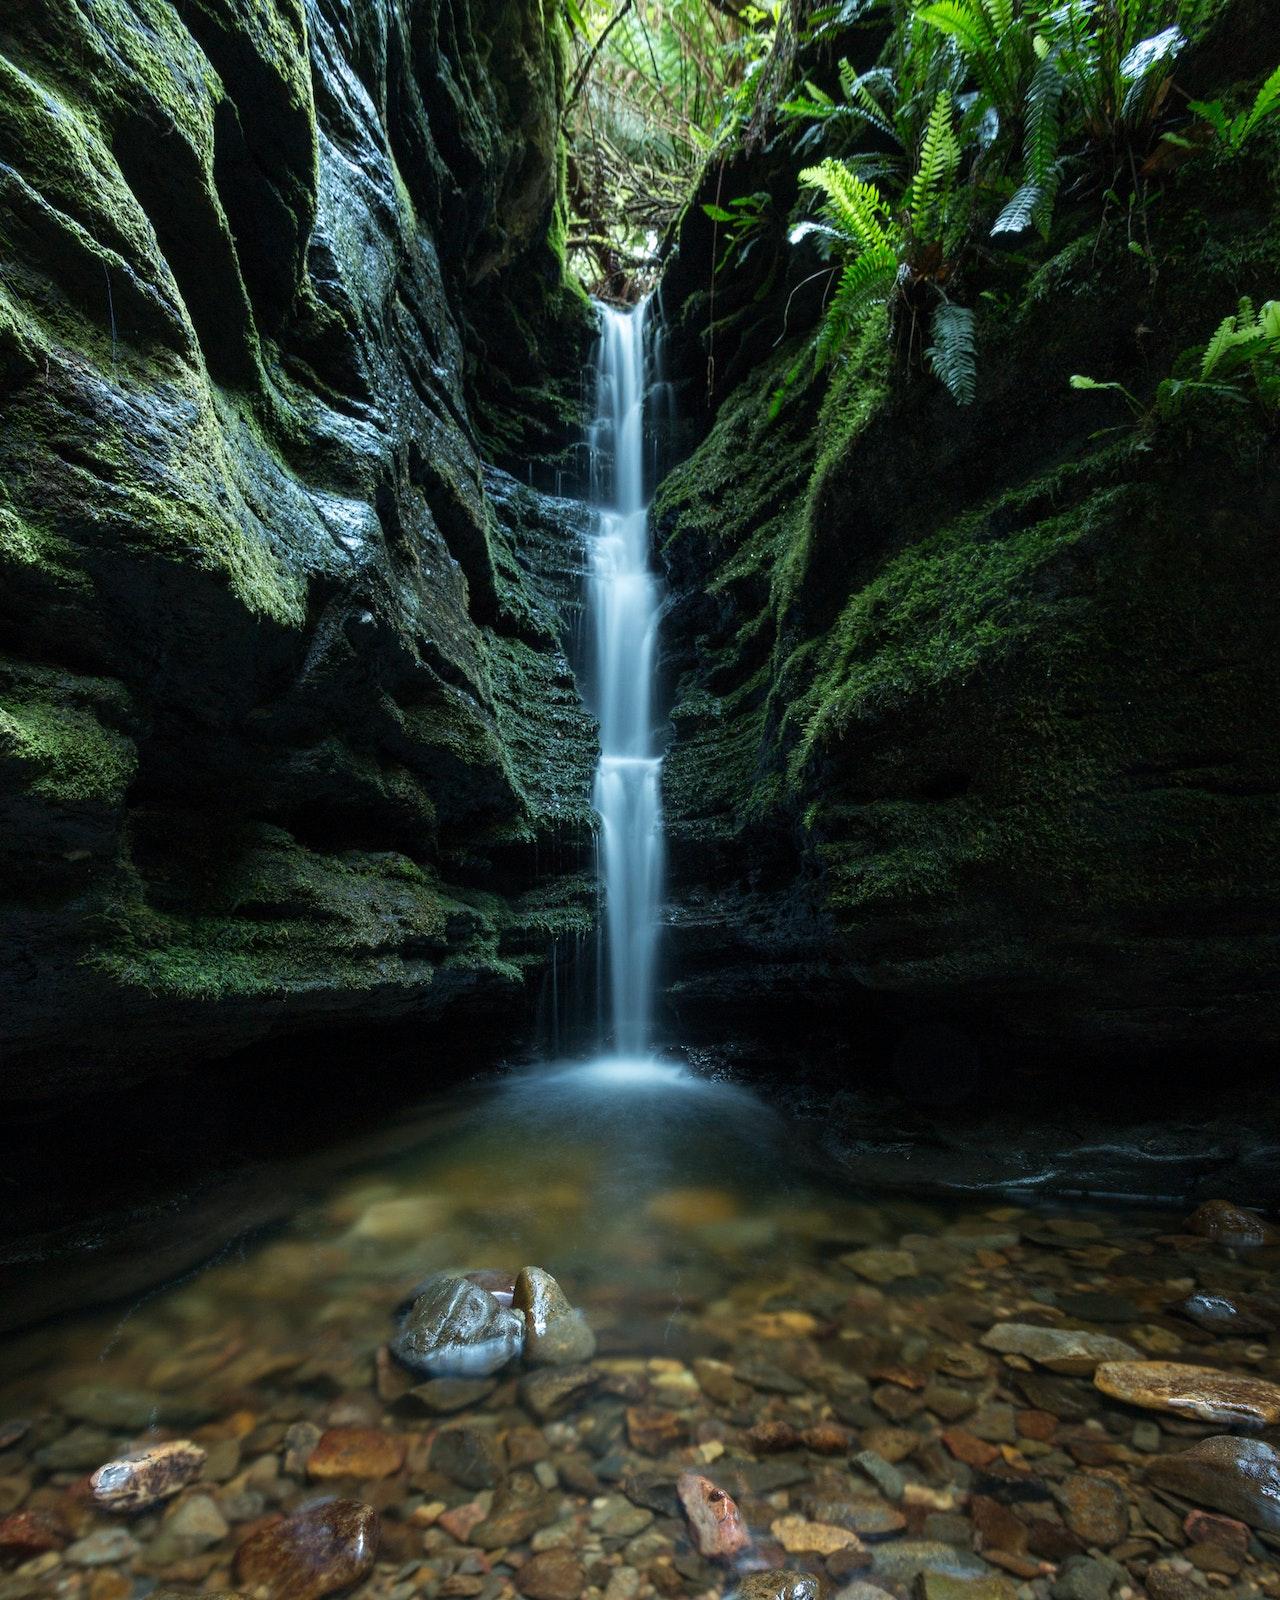 Secret Falls III - Hobart, Tasmania